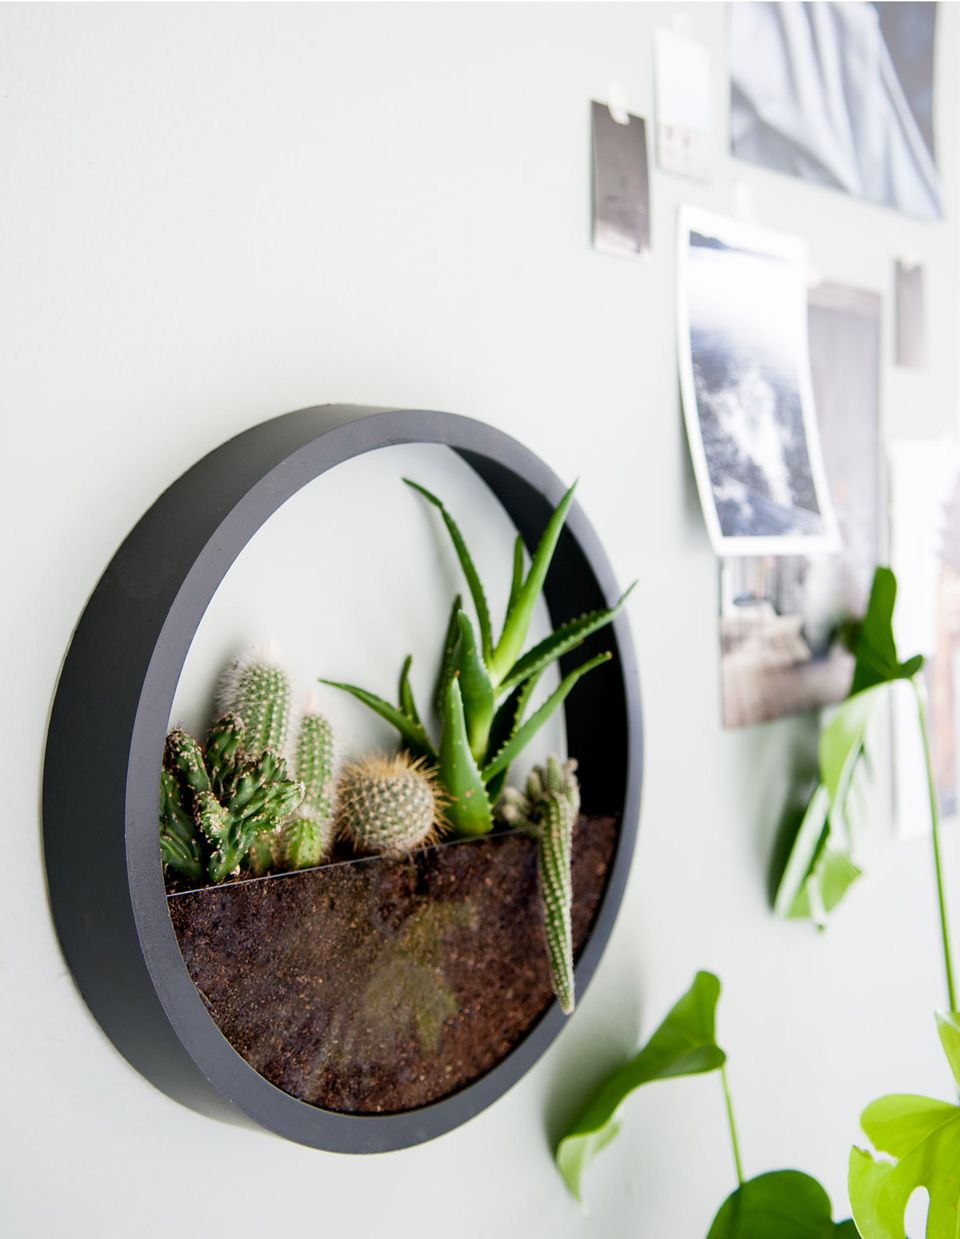 8 id es diy pour cr er un terrarium diy pinterest - Pinterest fruhlingsdeko ...